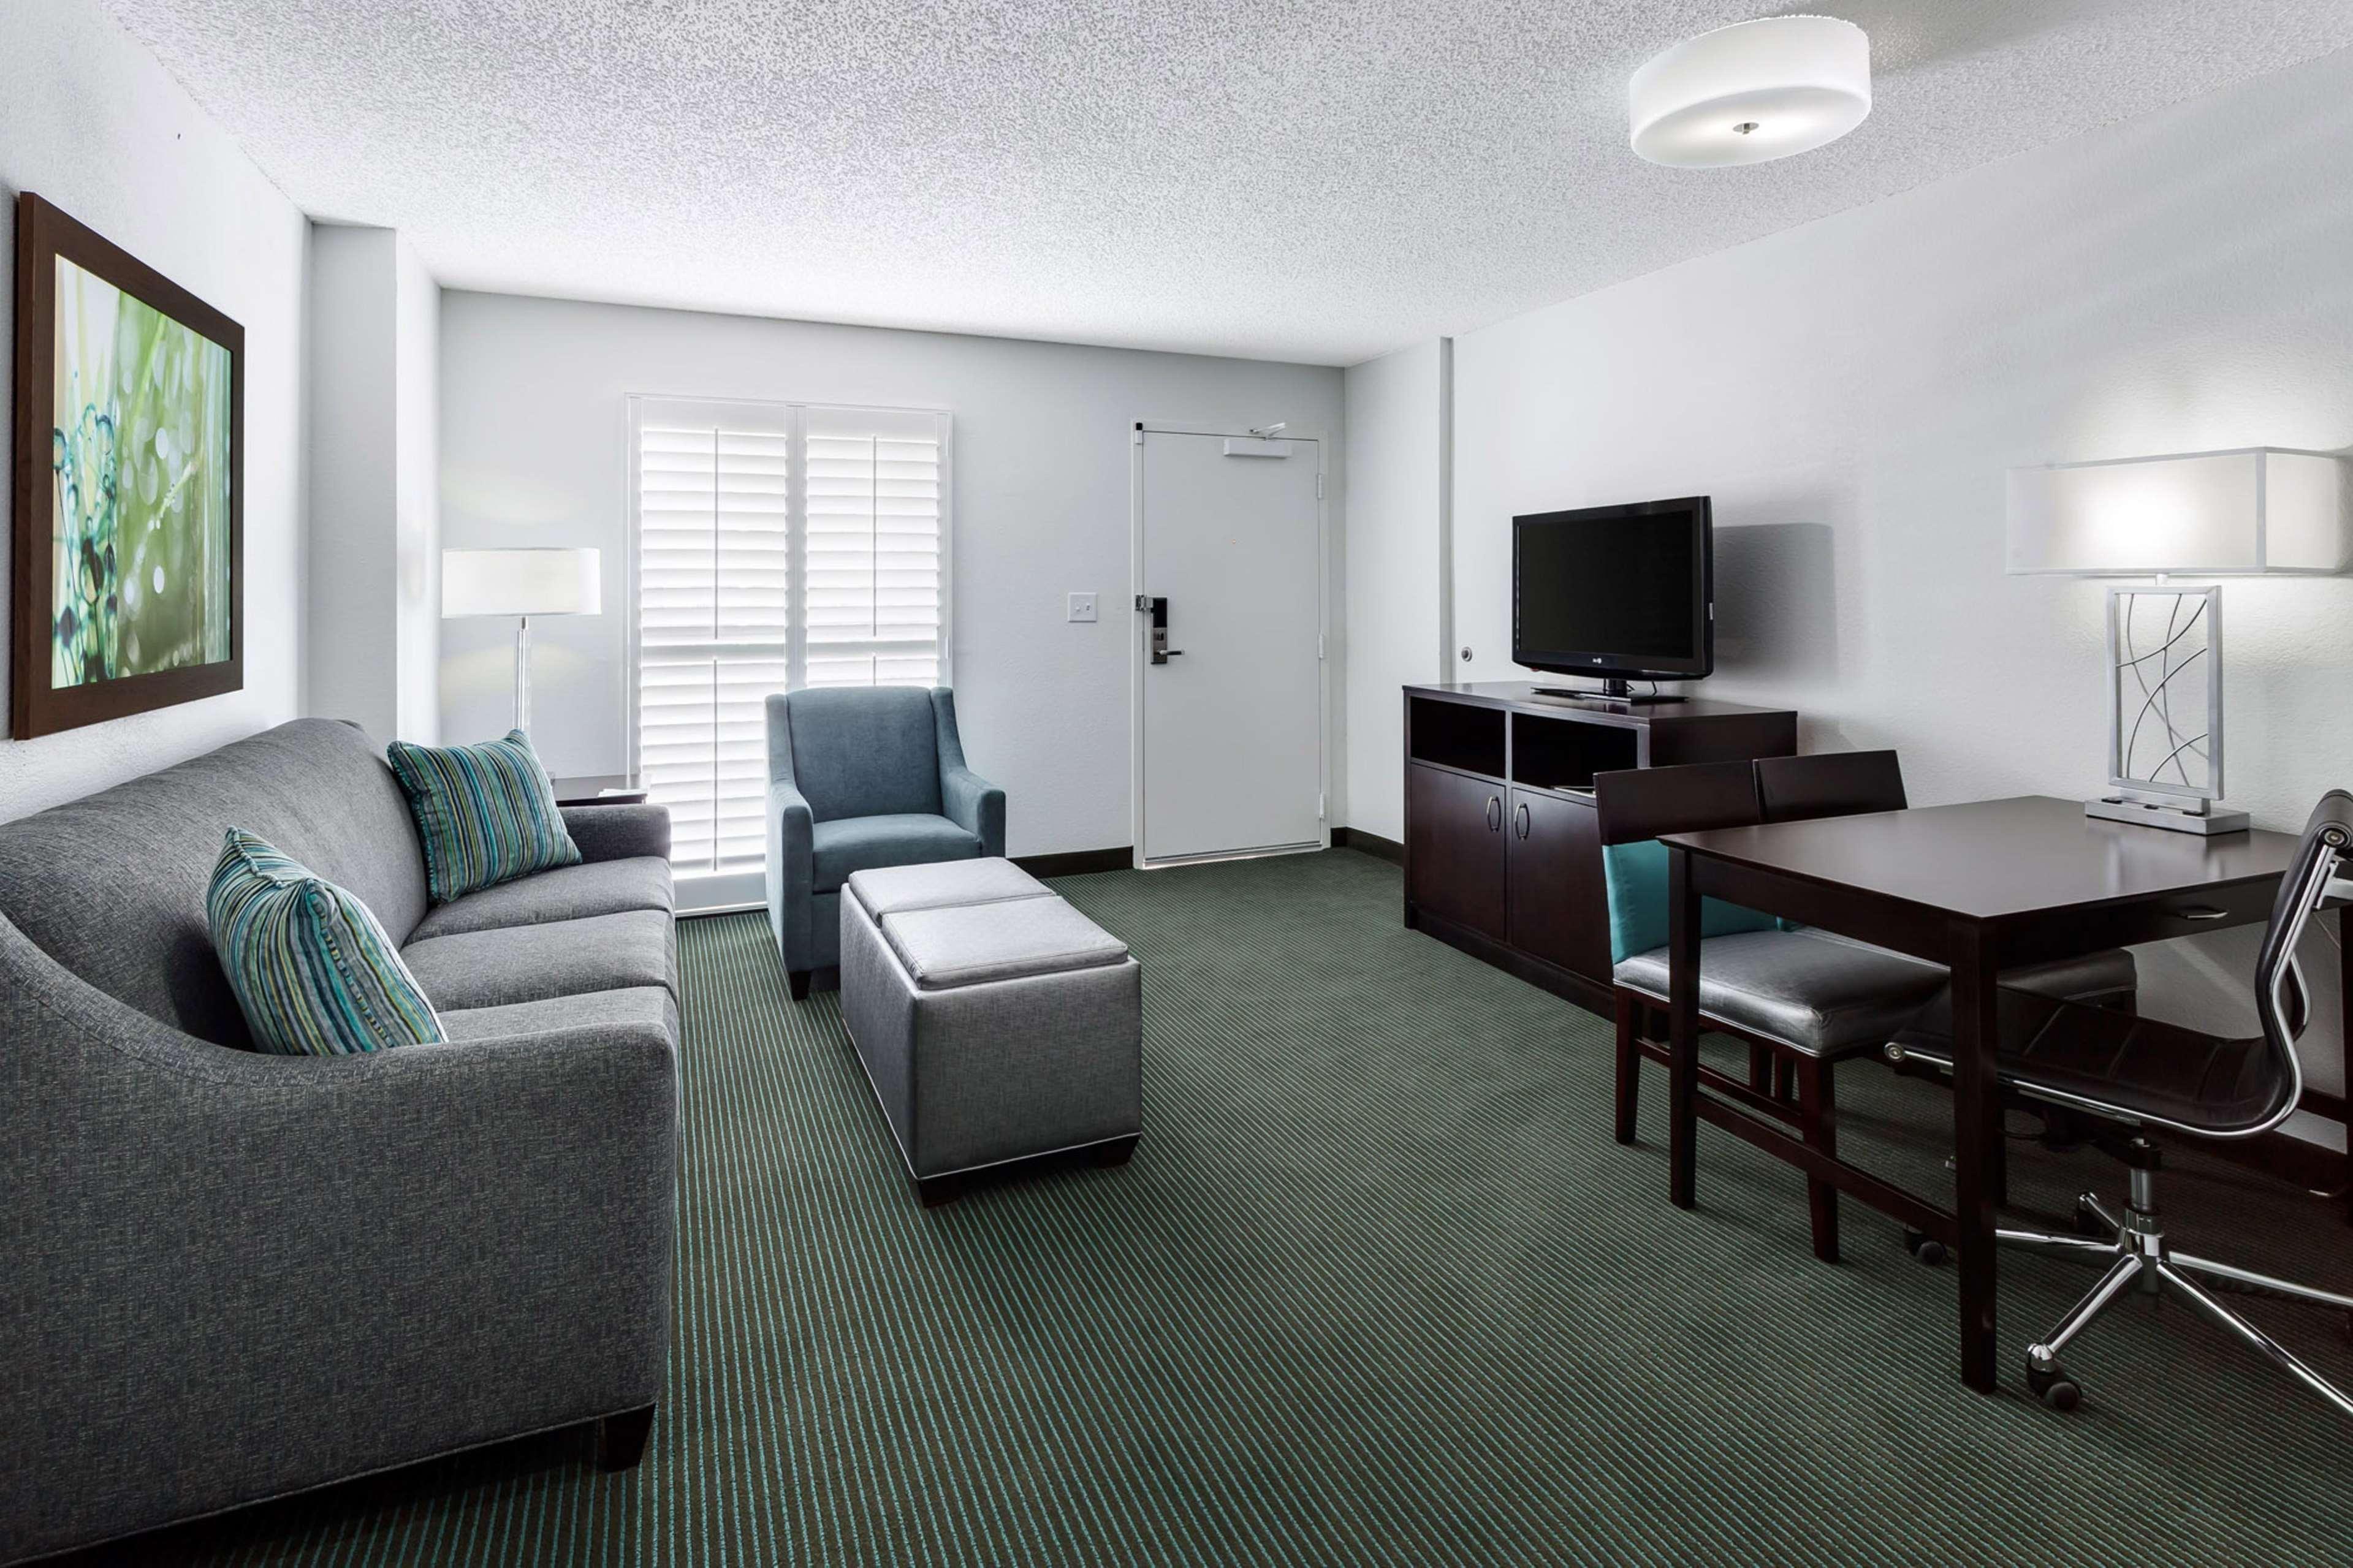 Embassy Suites by Hilton Orlando Lake Buena Vista Resort image 17